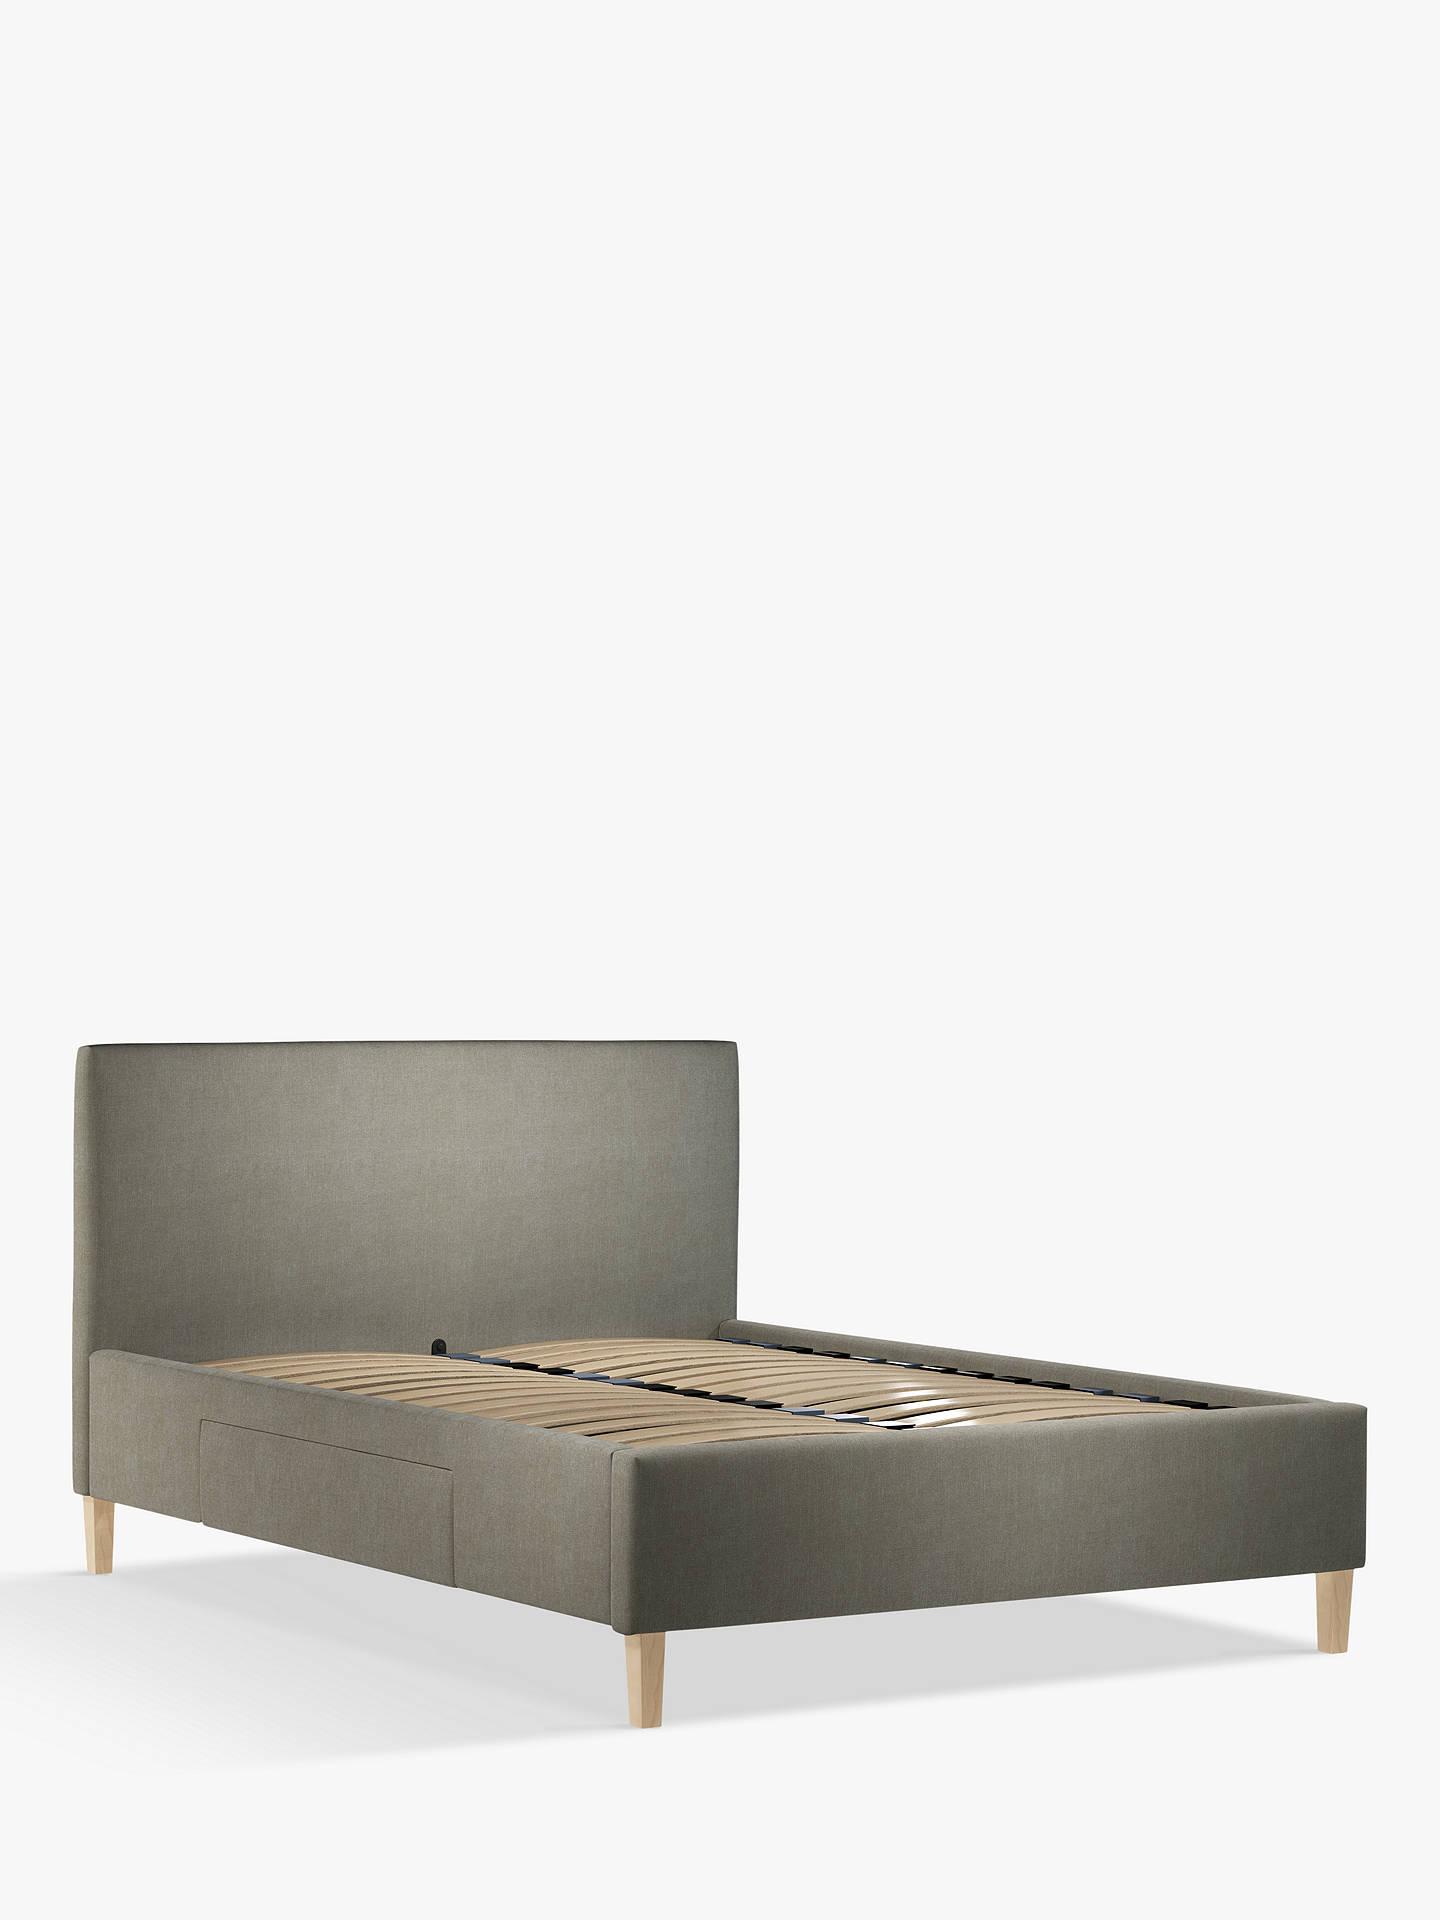 1399d10359c2 Buy John Lewis & Partners Emily 2 Drawer Storage Upholstered Bed Frame,  King Size, ...